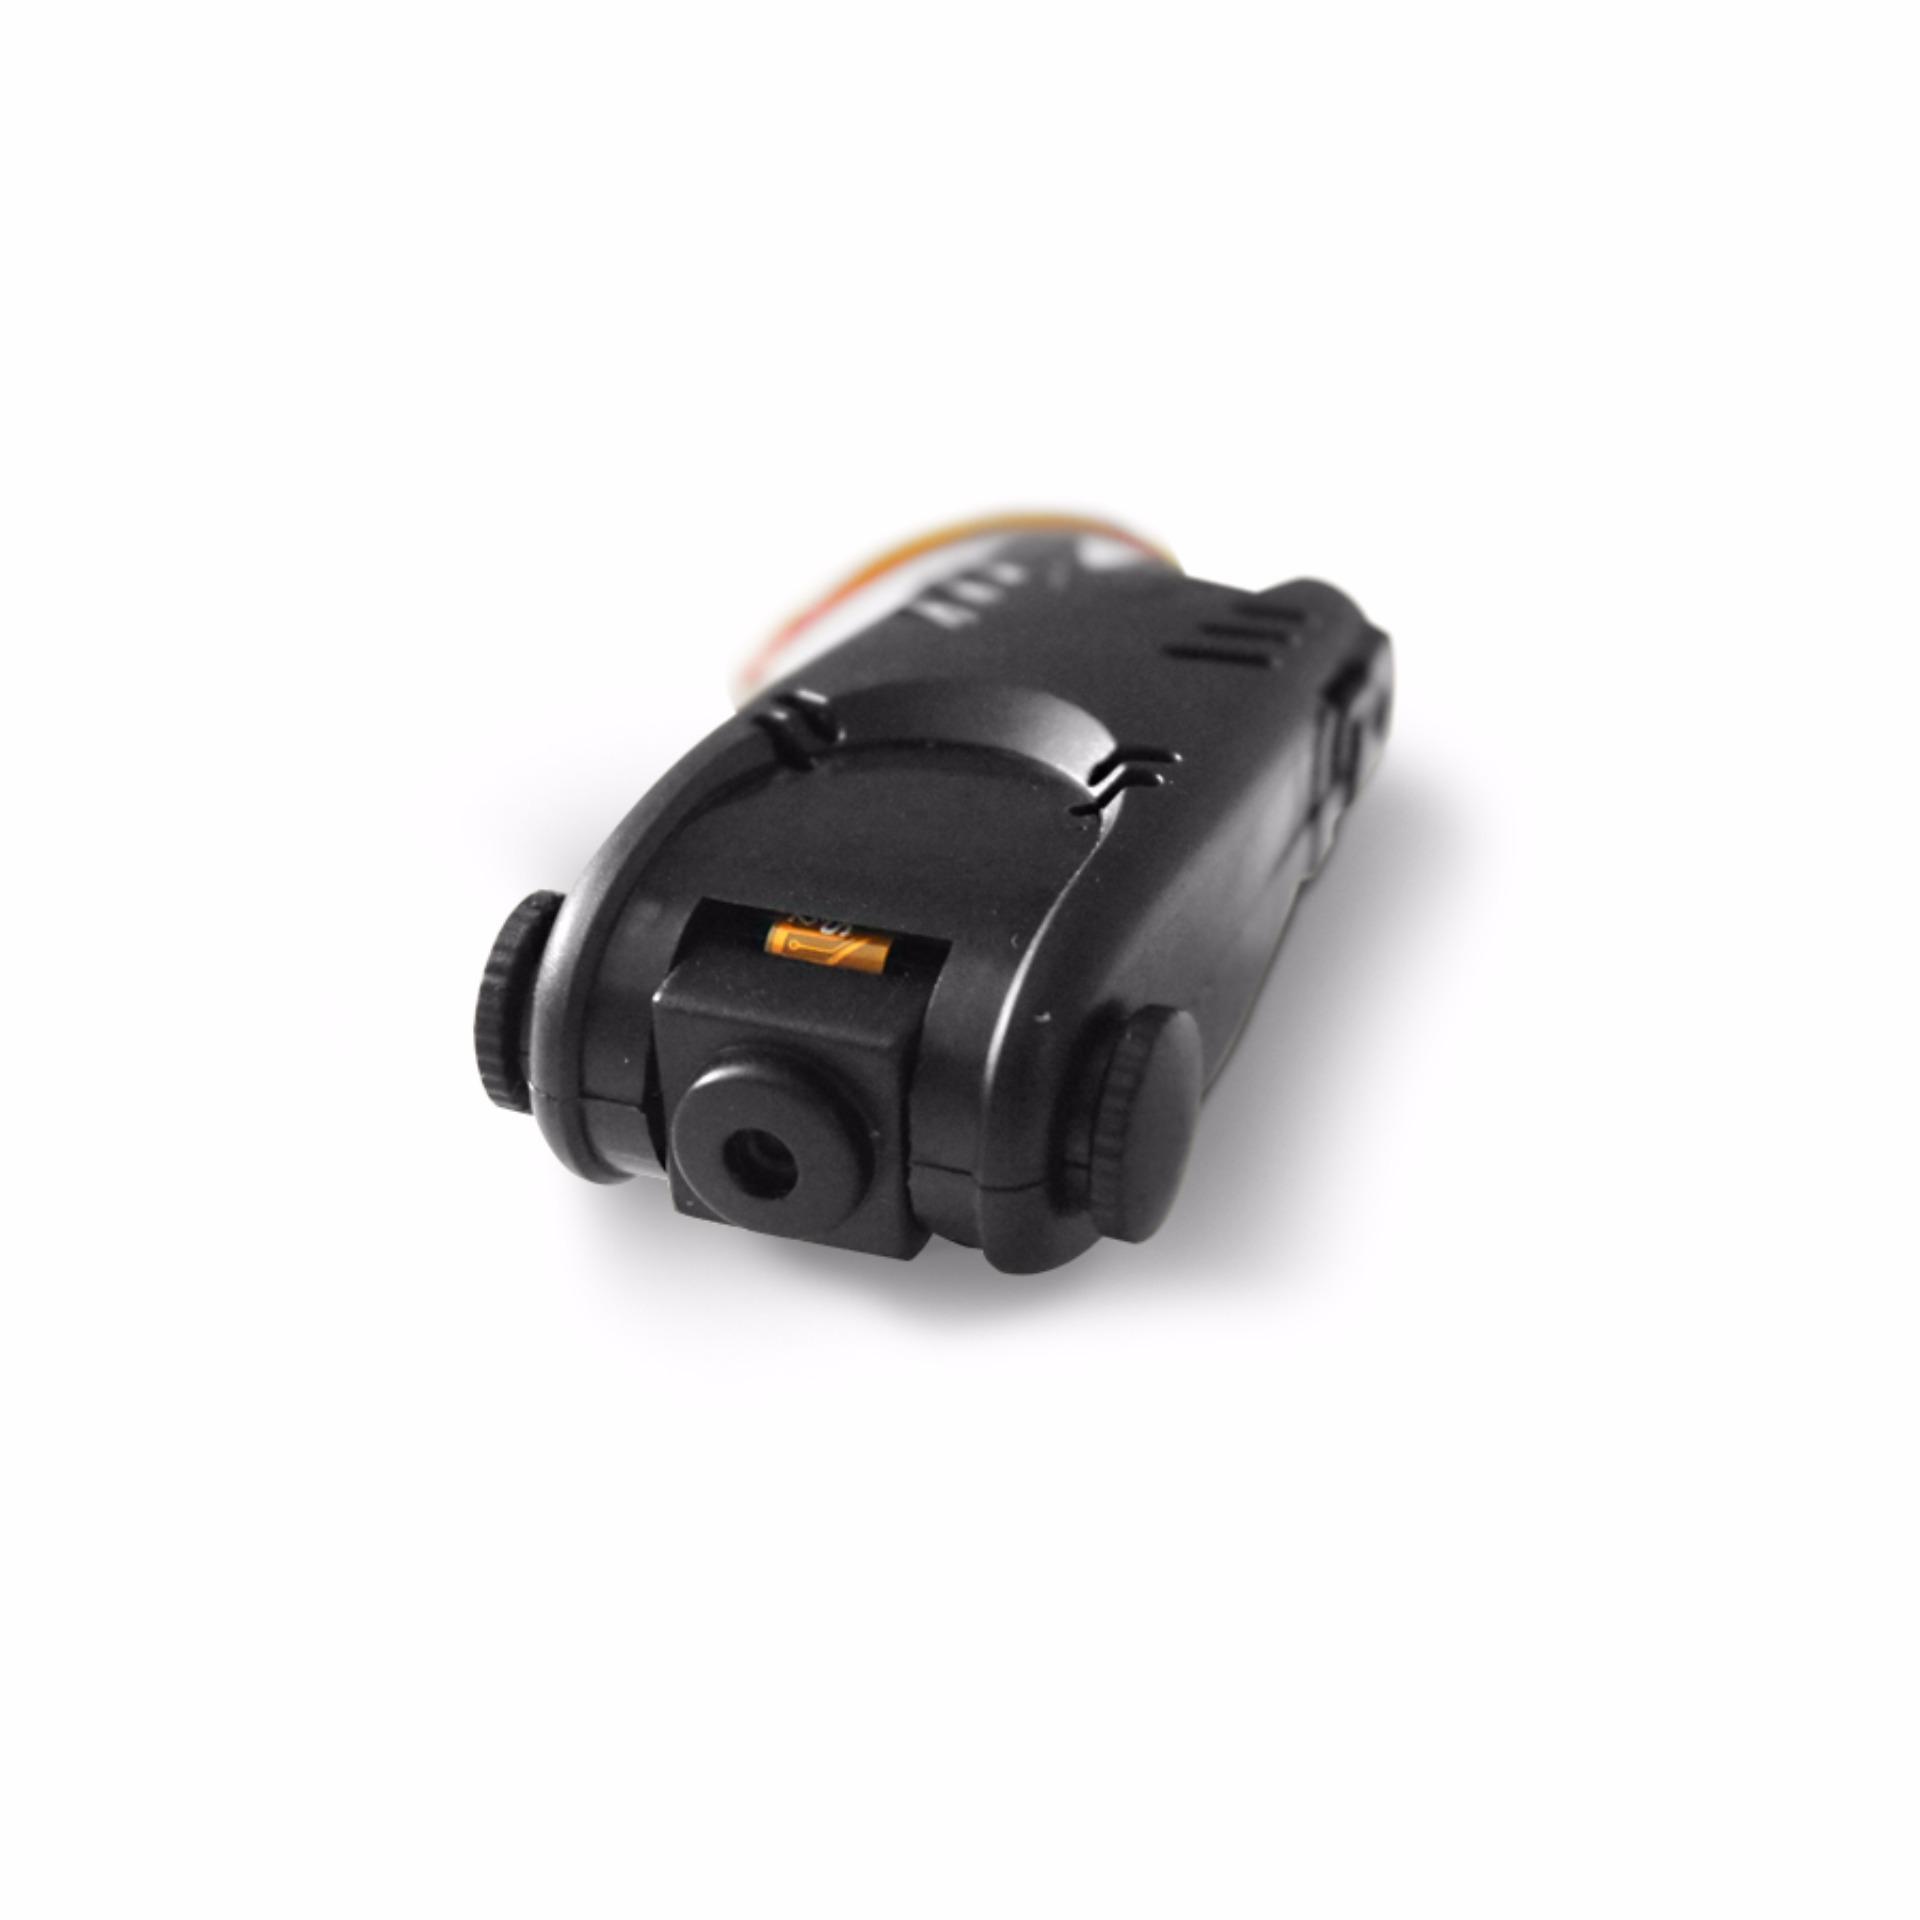 JJRC H31-2 2-megapixel camera (Black)